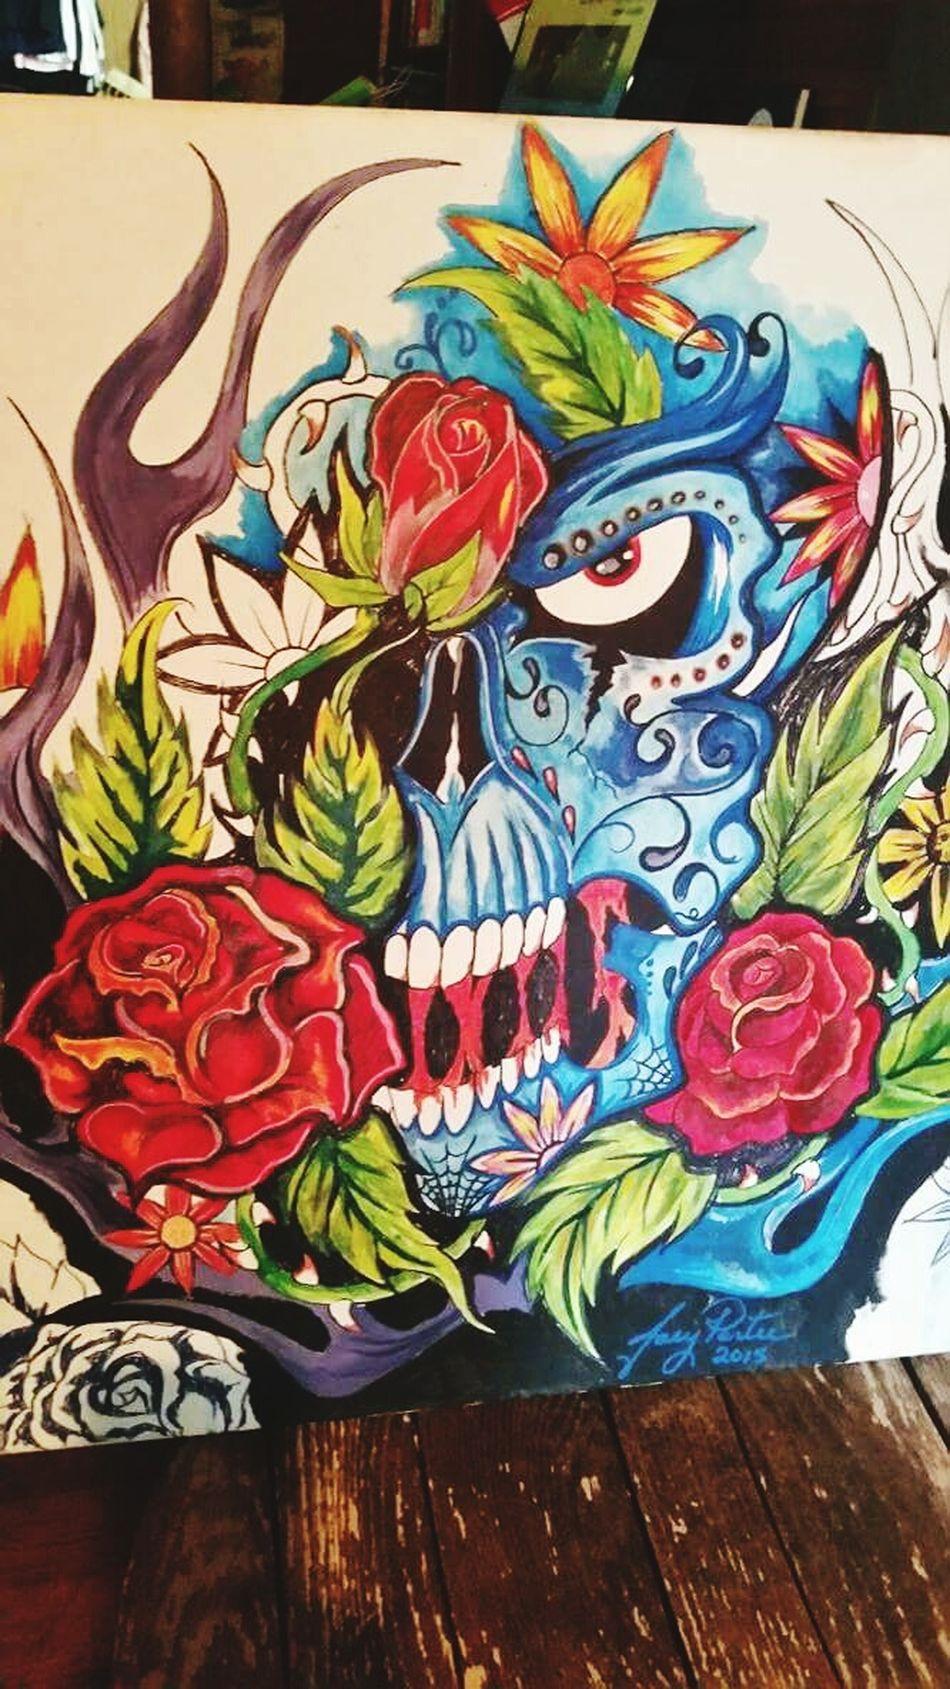 Art Is Everywhere Skullart Skulls Roses Beautifully Dark Bright Colors Painting Art Art And Craft Multi Colored No People